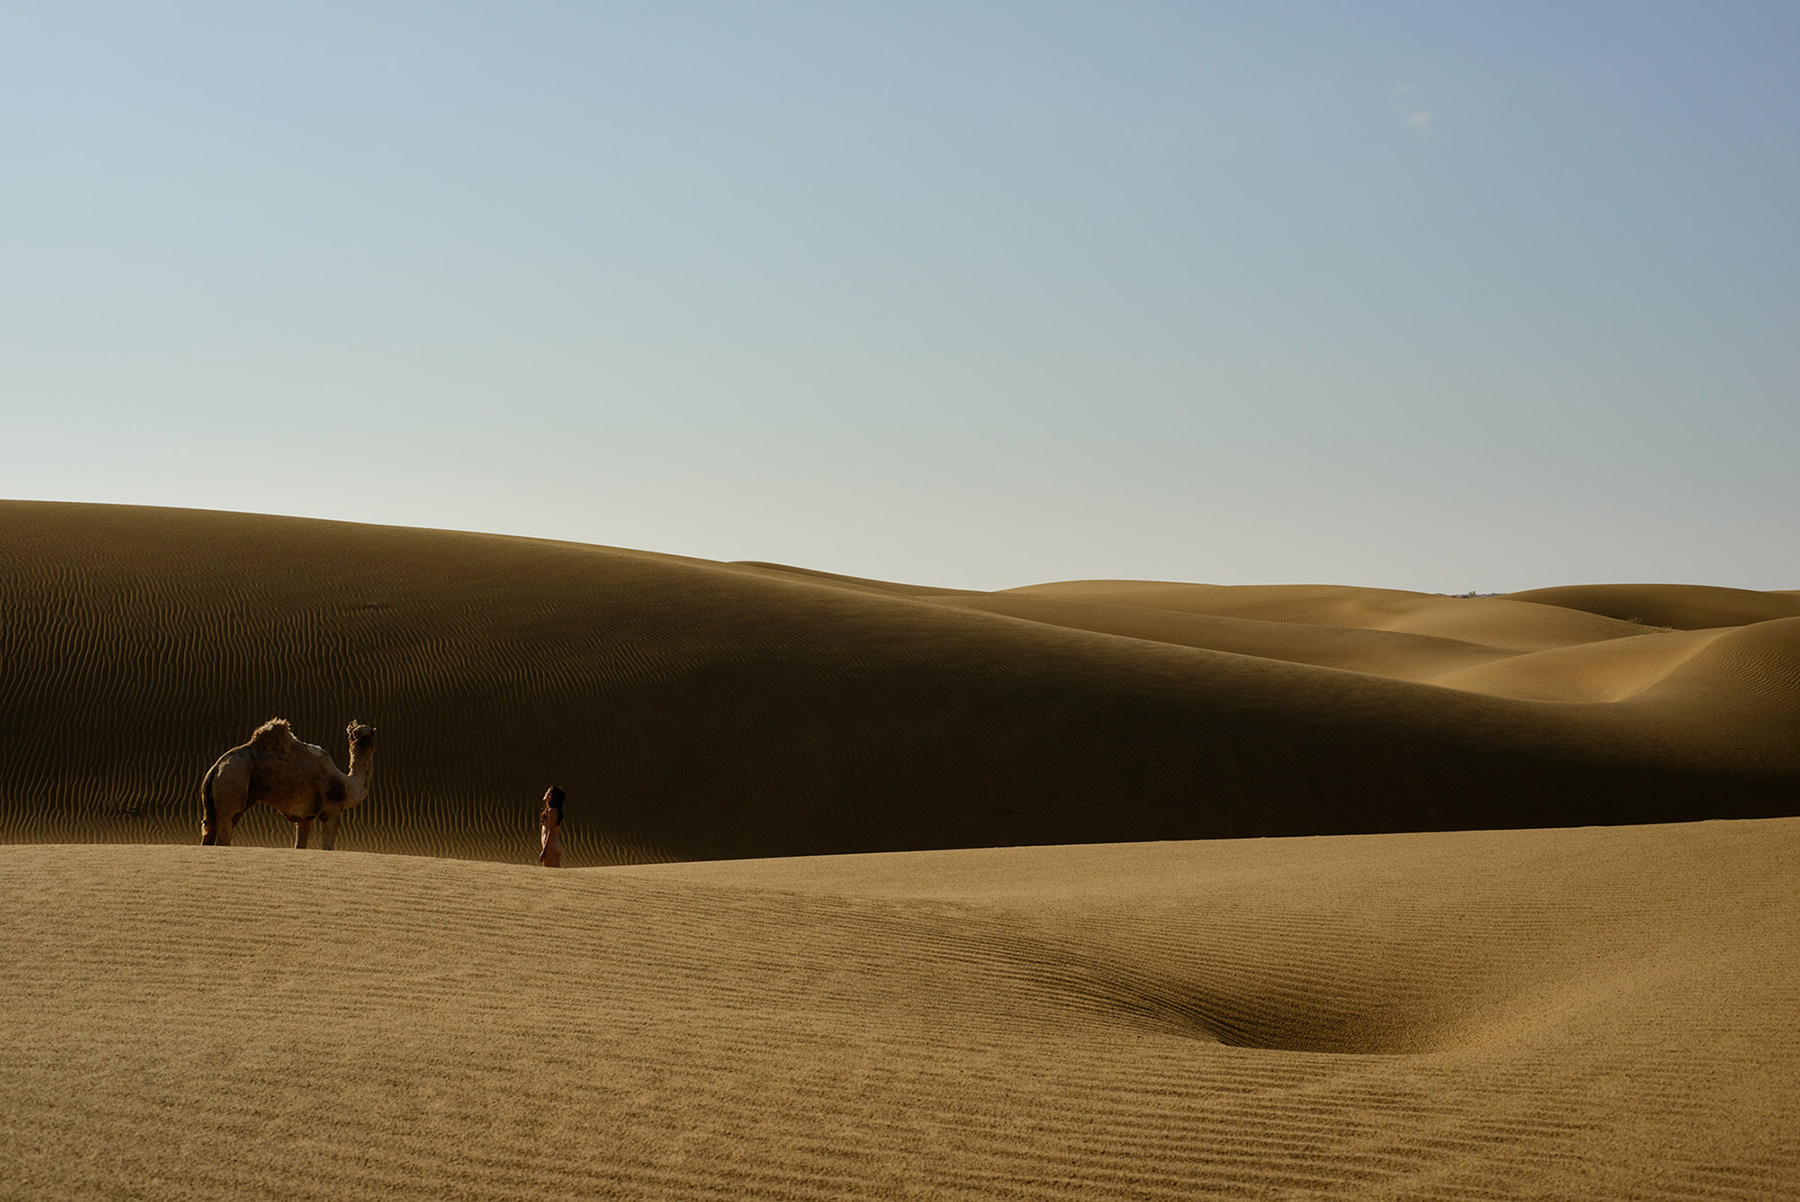 Siyala Dunes, <br>India, Thar Desert 4